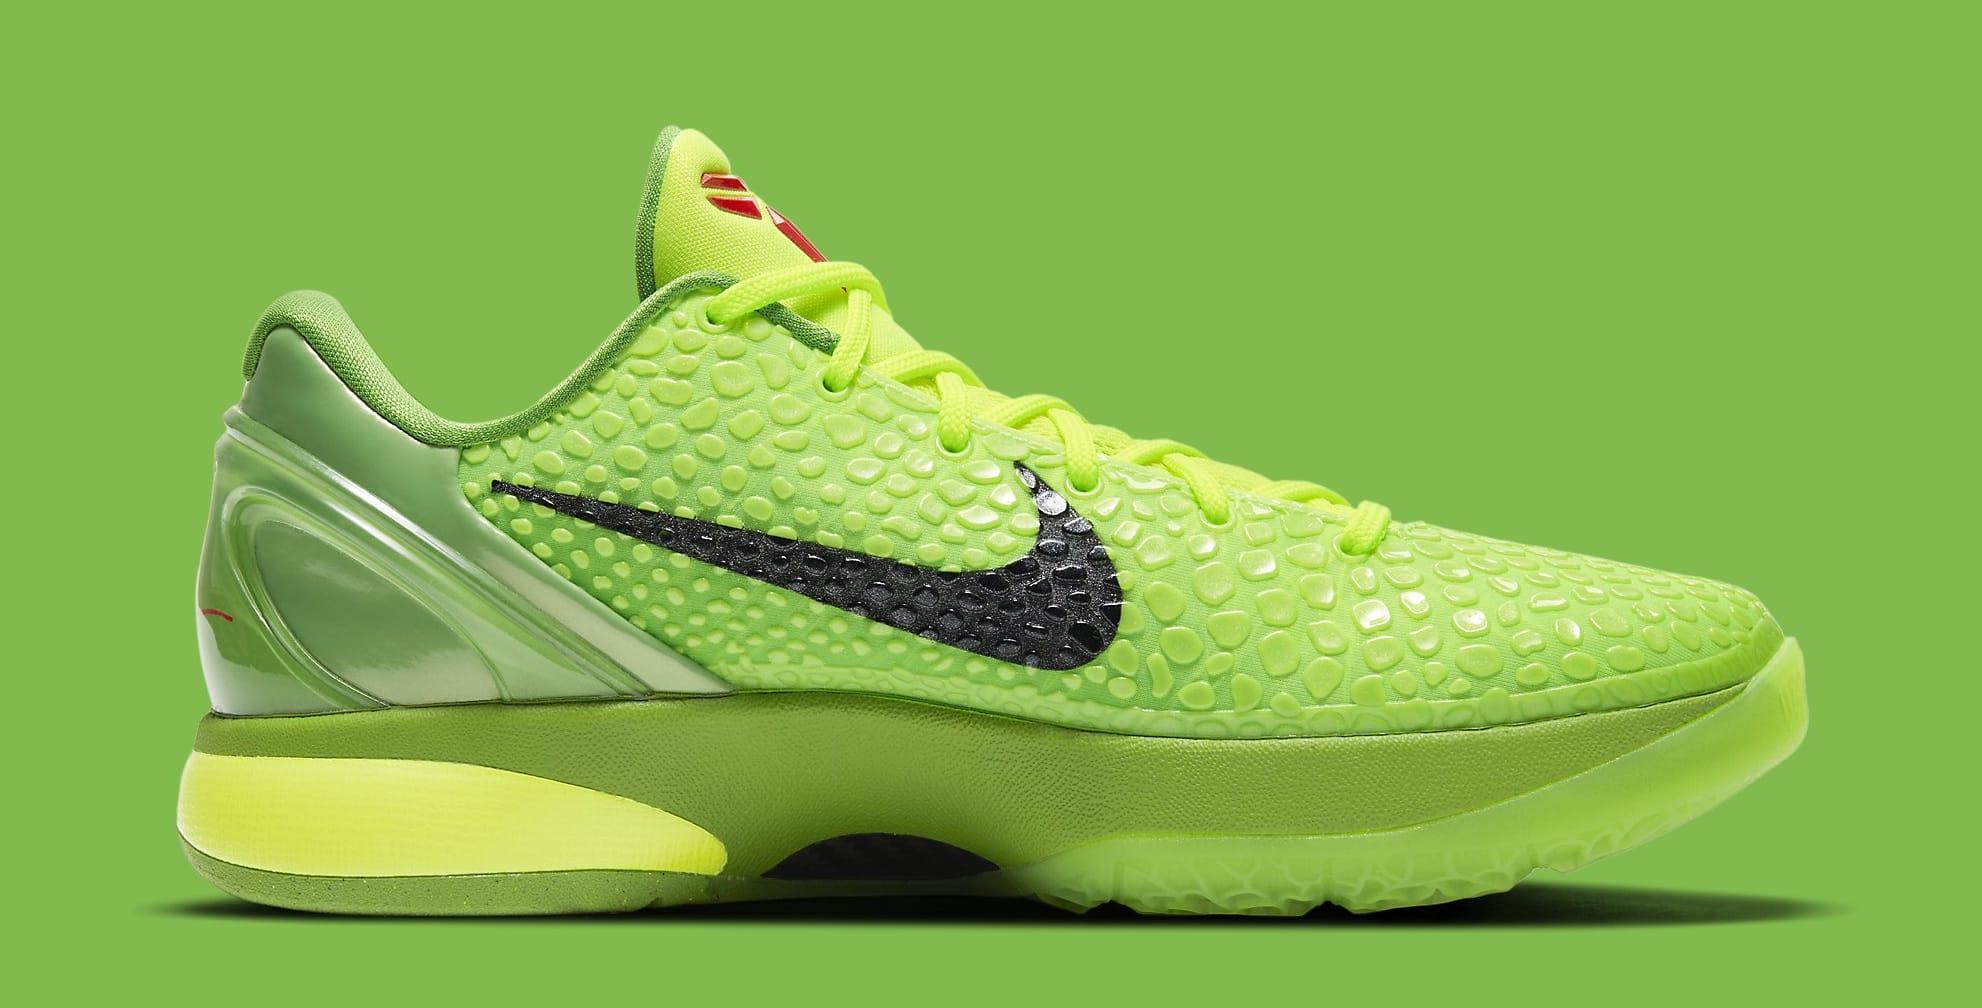 Nike Kobe 6 Protro 'Grinch' CW2190-300 Medial